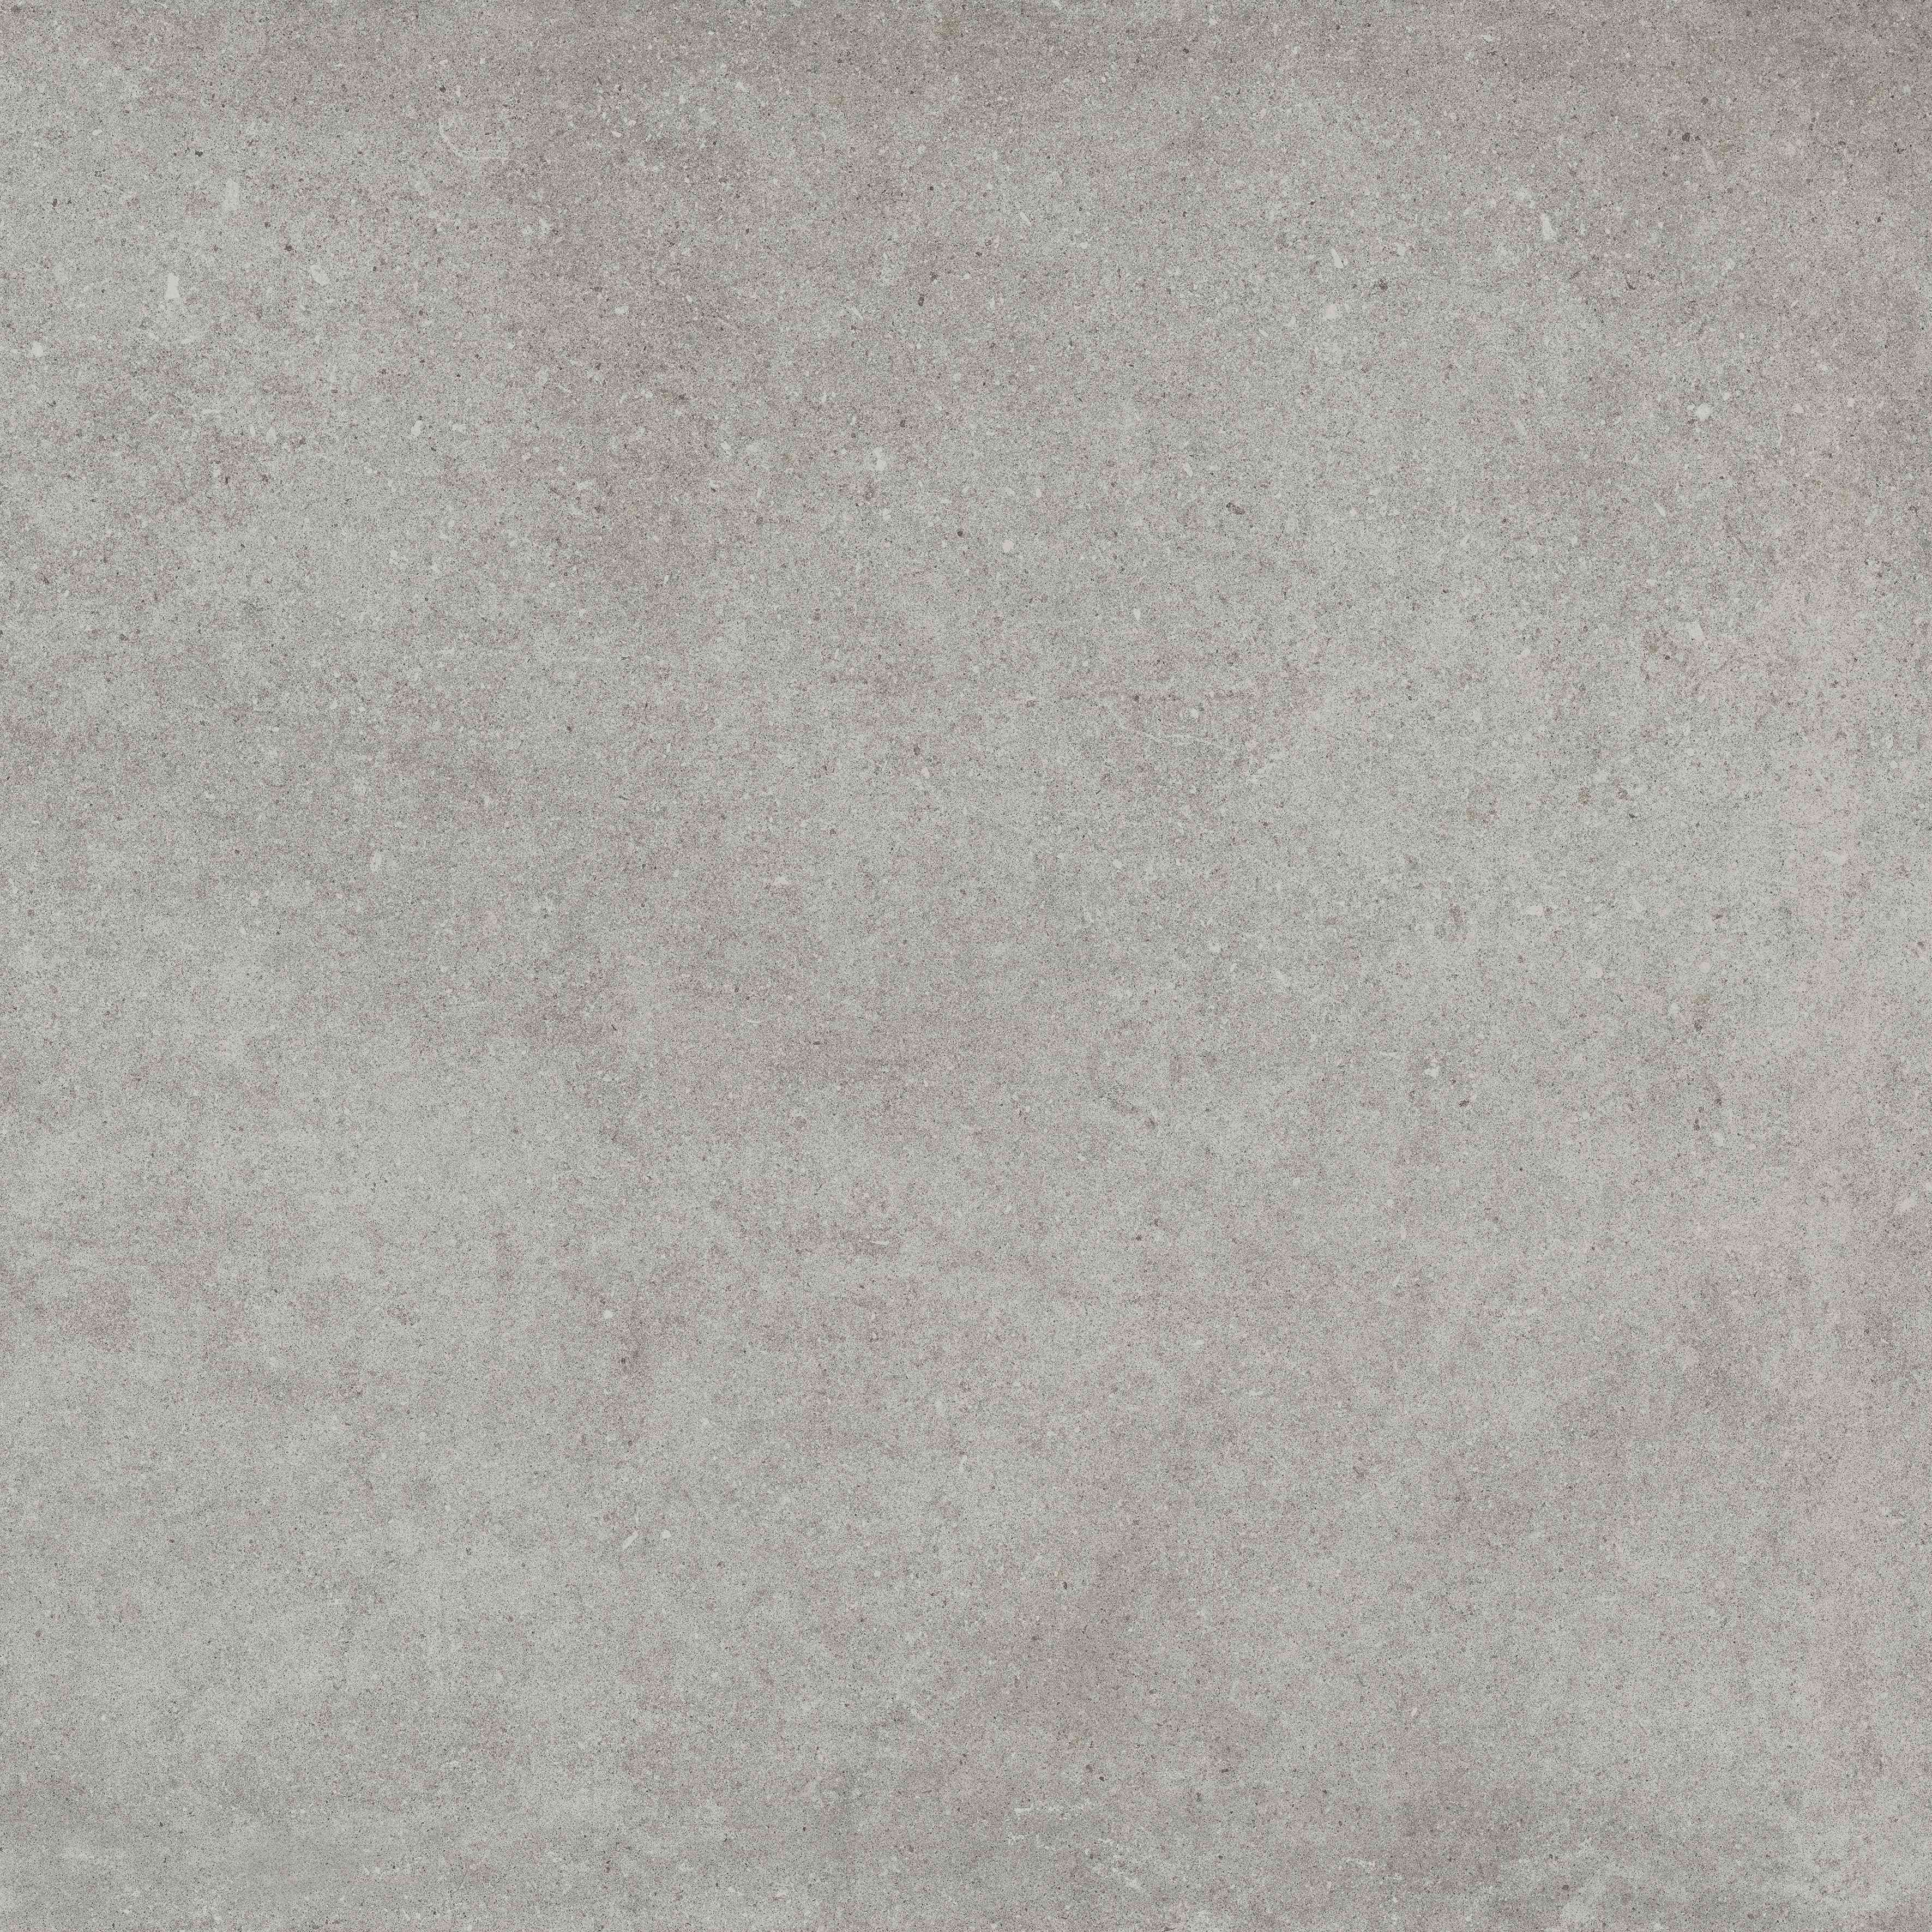 Плитка GRIGIO (ZRXRM8R) изображение 12